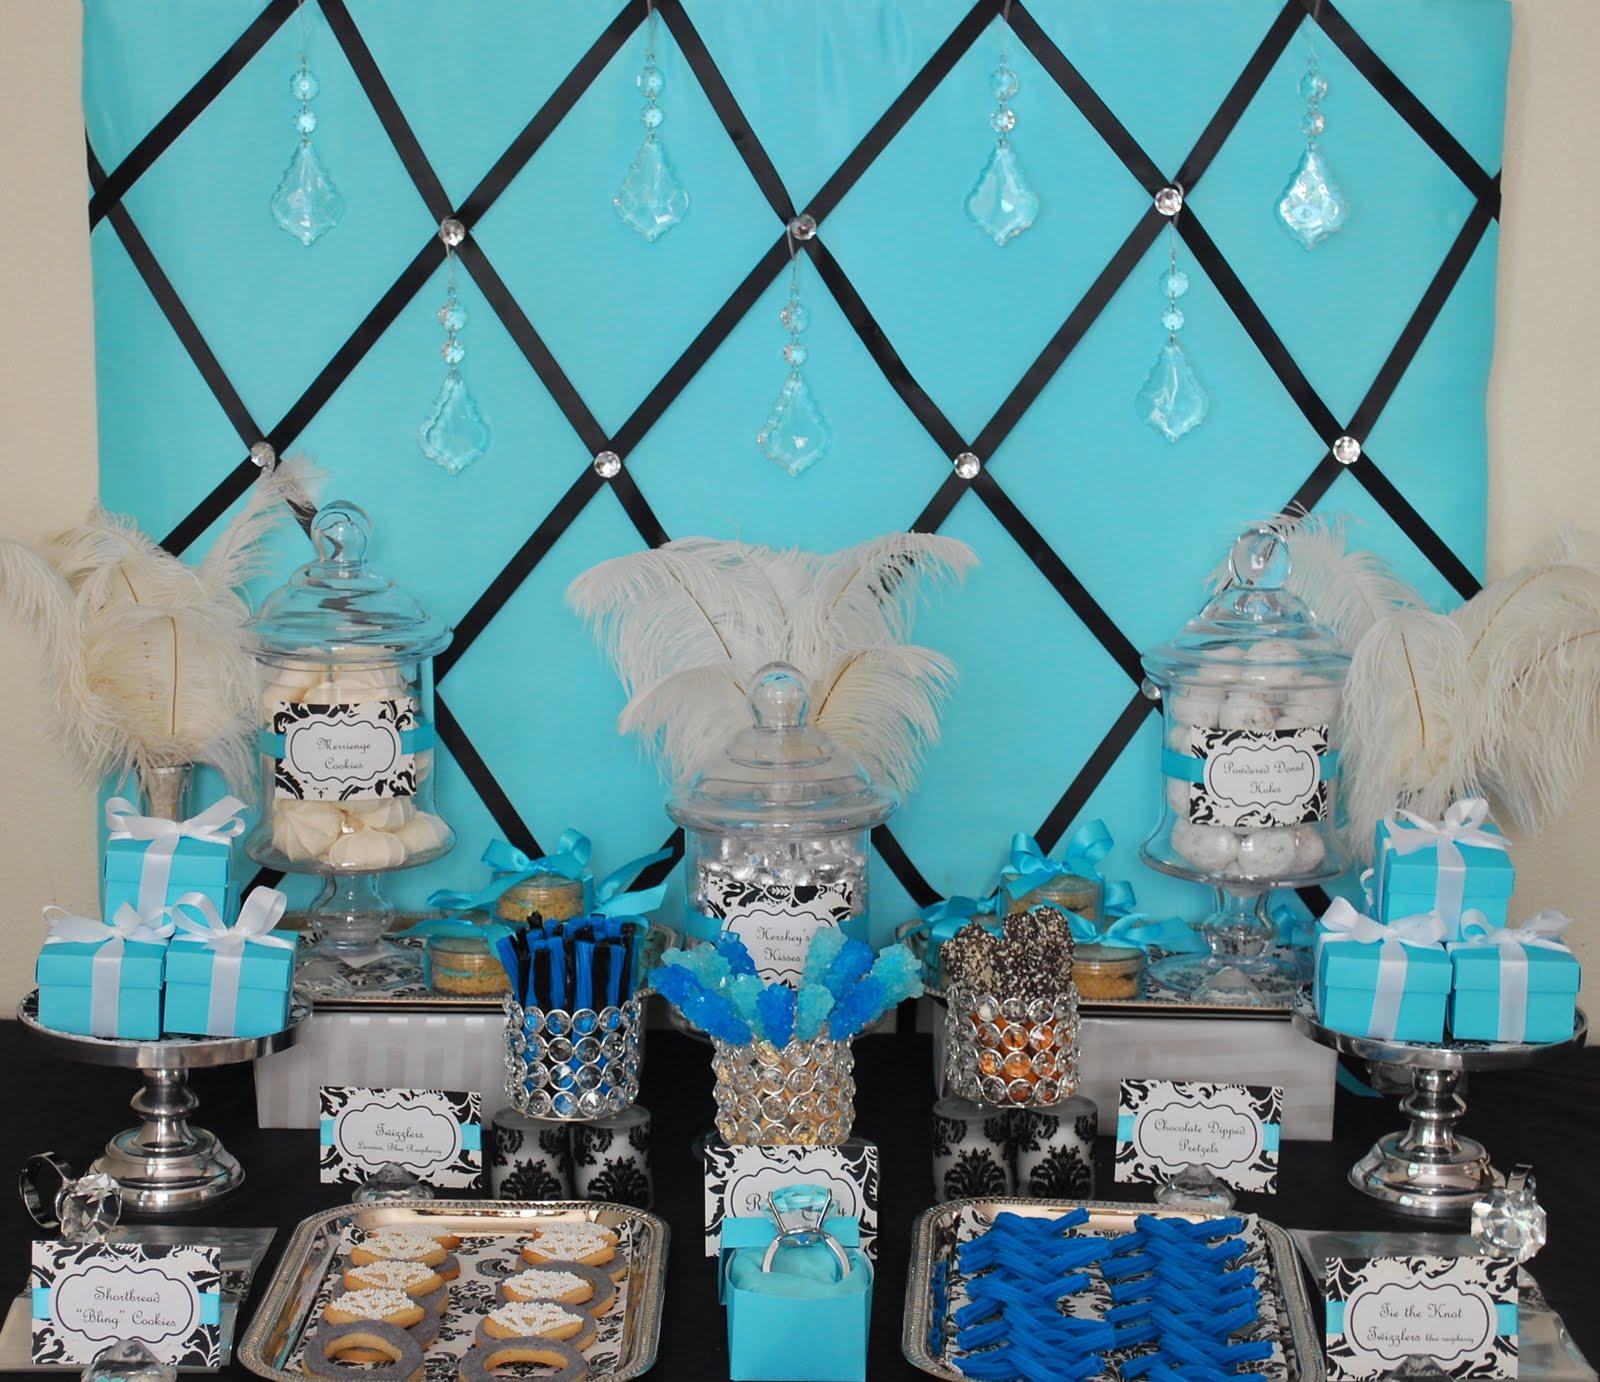 Tiffany Blue And Black Wedding Ideas: Fête Fanatic: Tiffany Blue Black & Bling Sweets Display